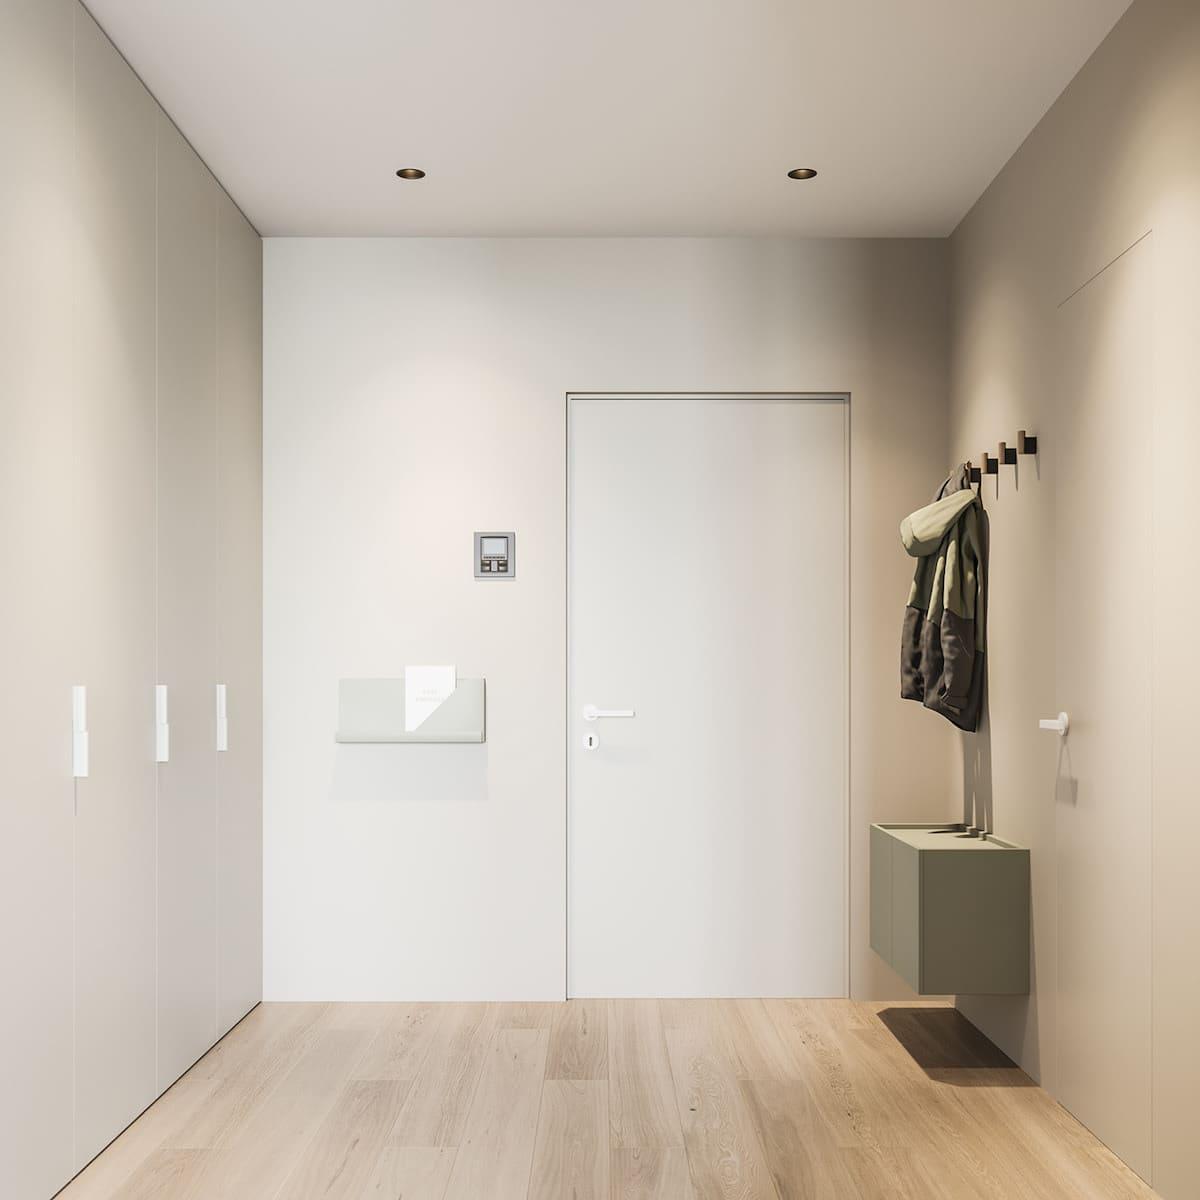 дизайн интерьера модной квартиры фото 49